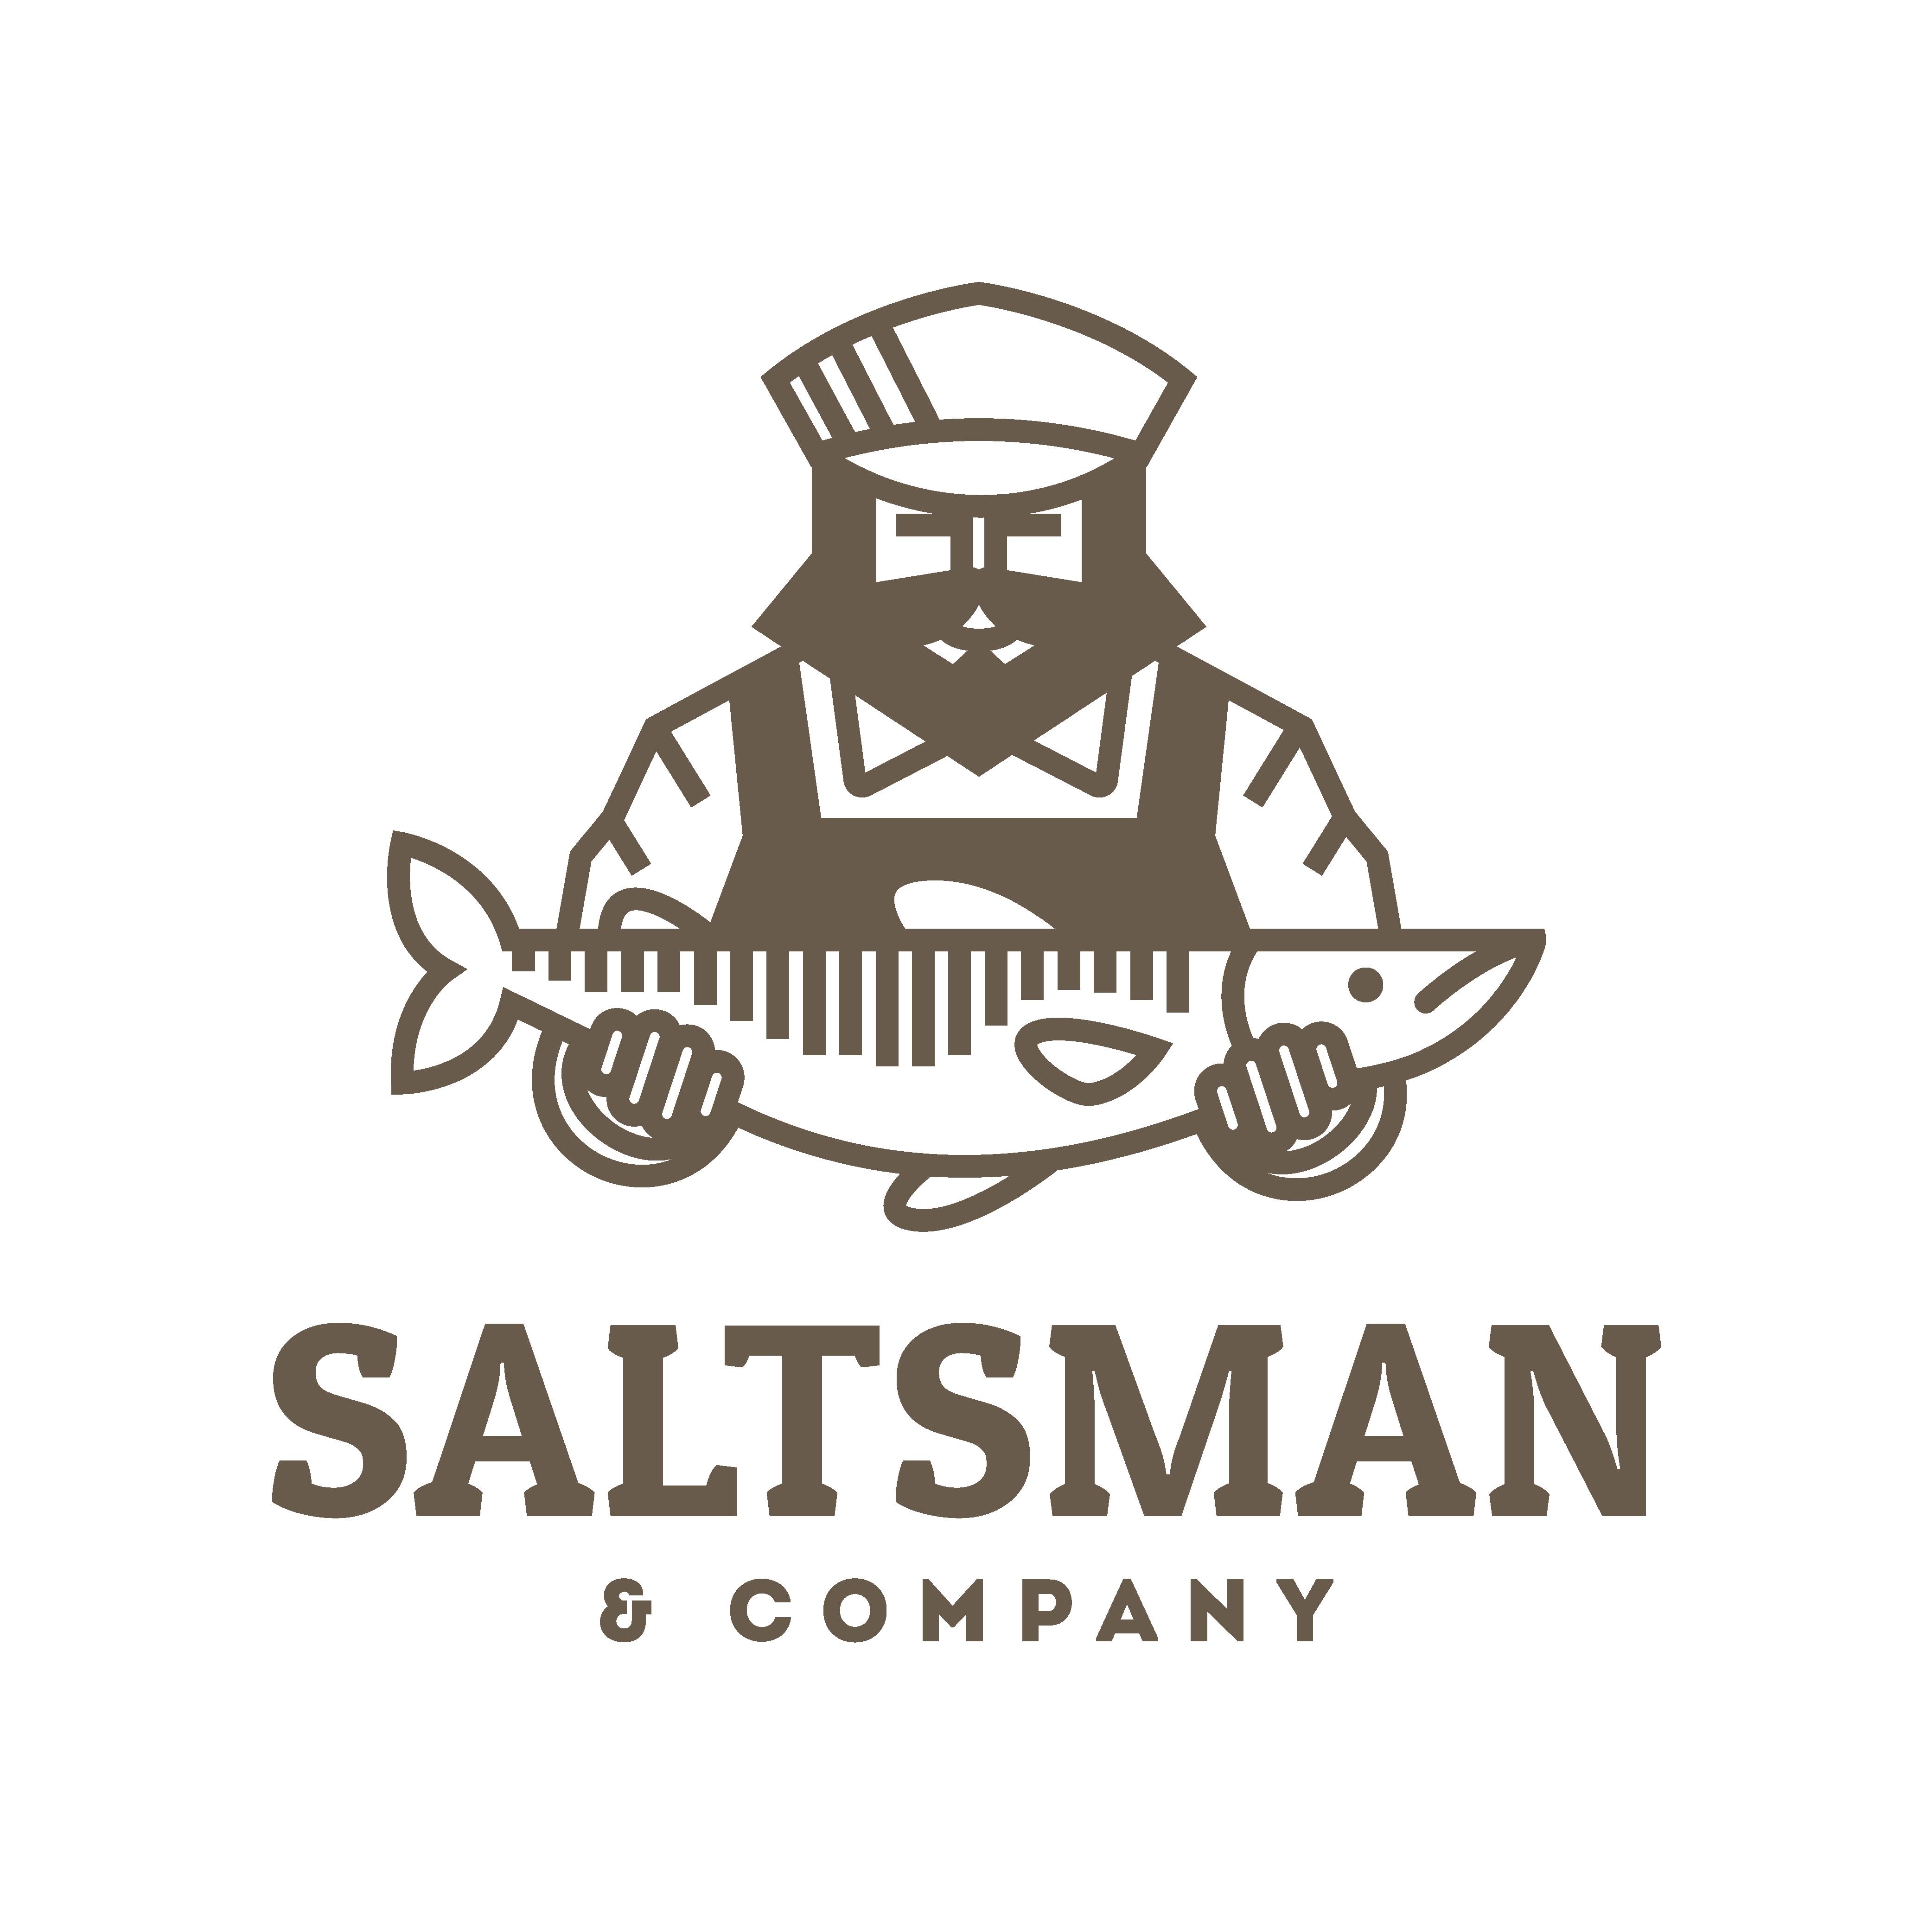 Slightly sophisticated, nautical logo for lifestyle brand